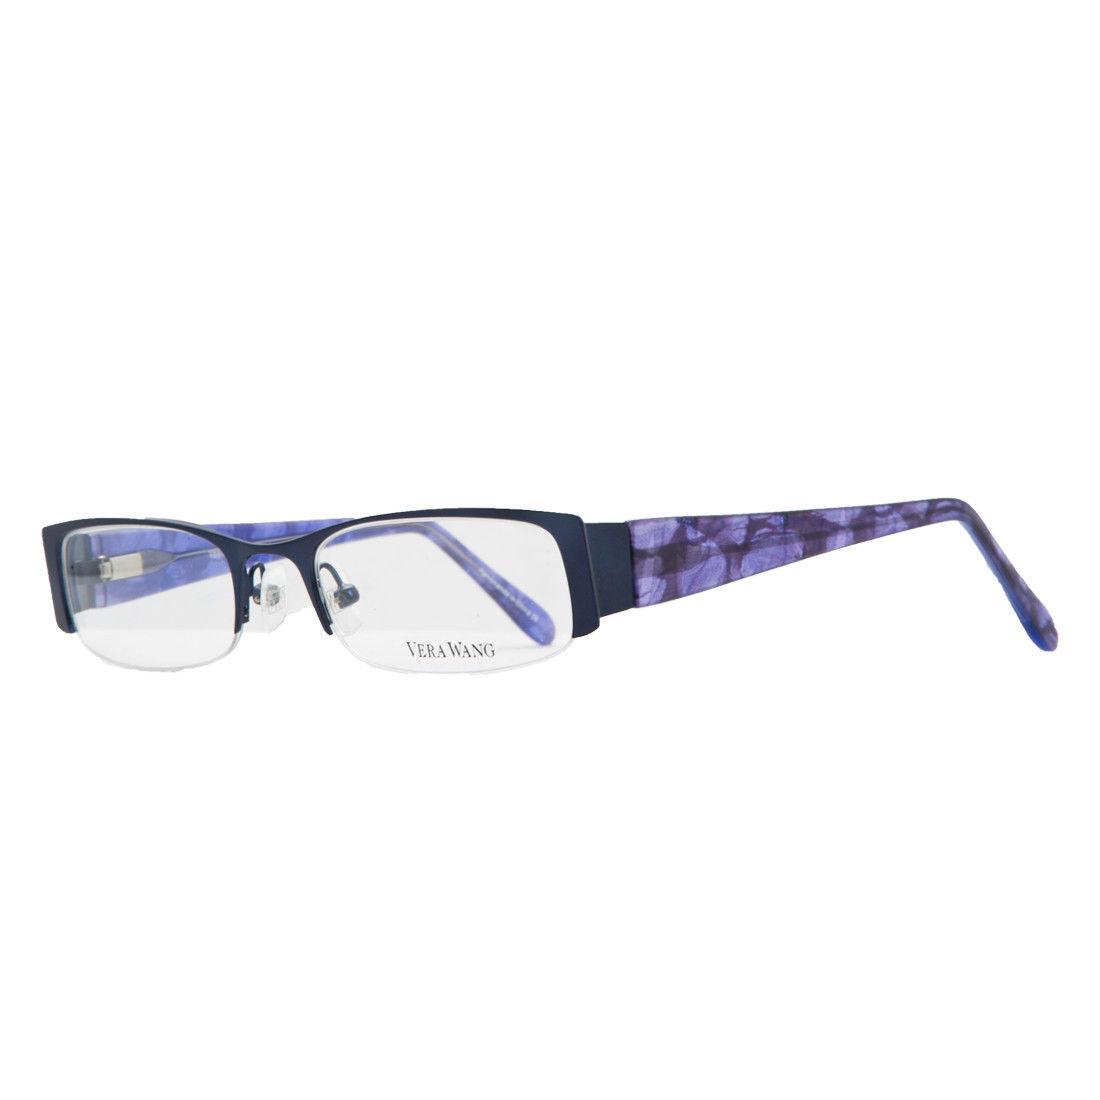 Vera Wang V 045 IR 48 Iris Full Rim Womens Optical Frame